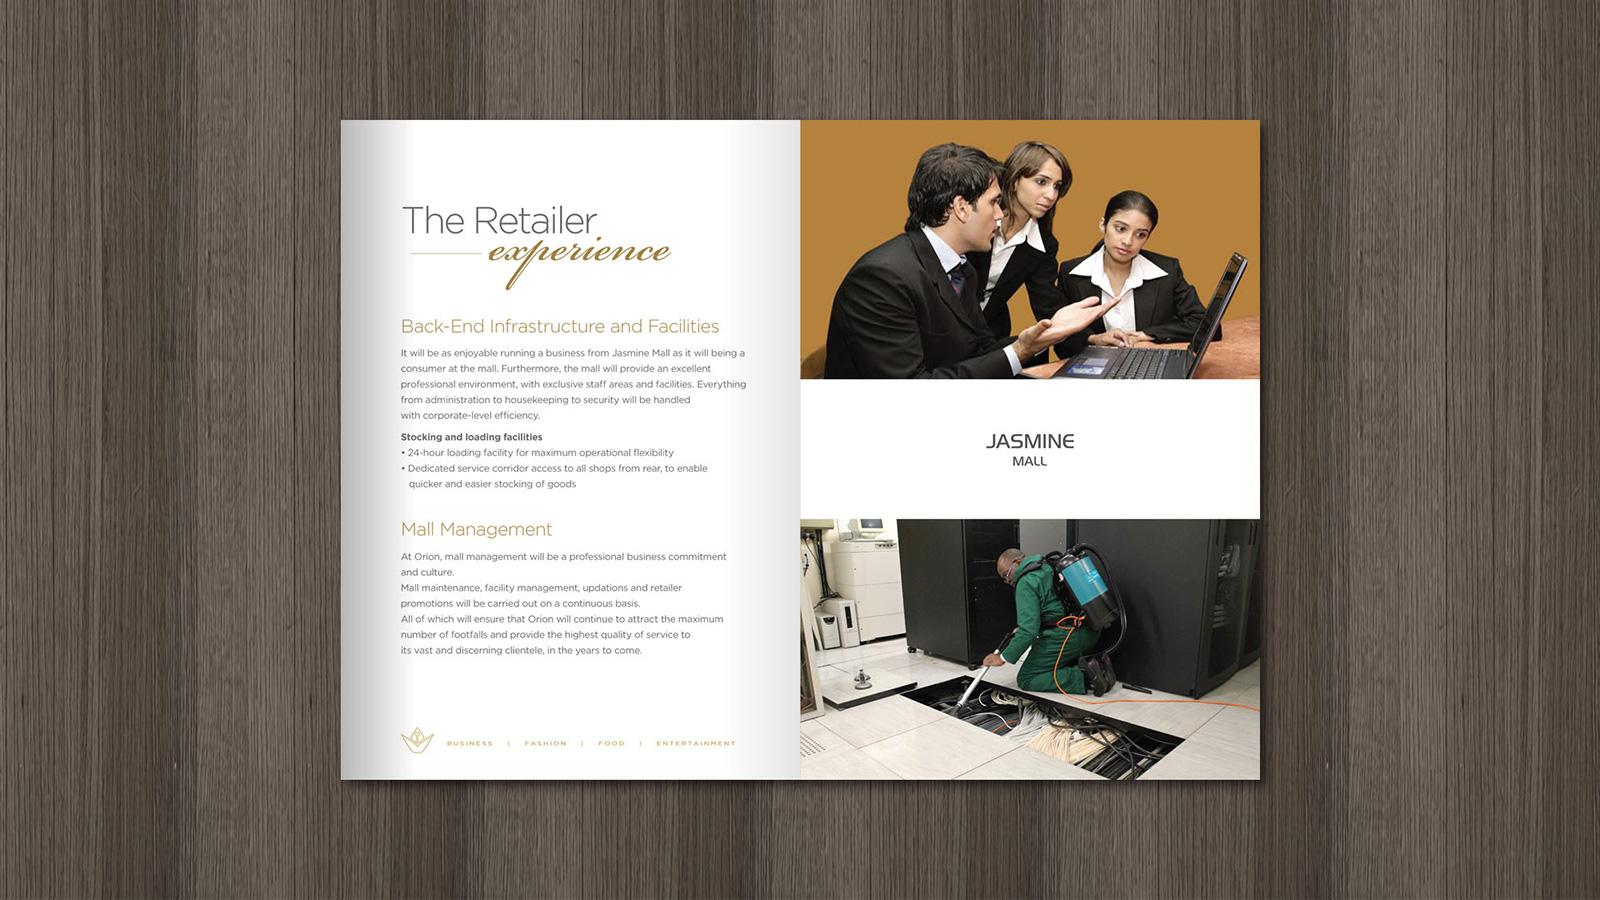 graphic-brand-design-web-designer-hiline-lahore-pakistan-jasmine-mall-009